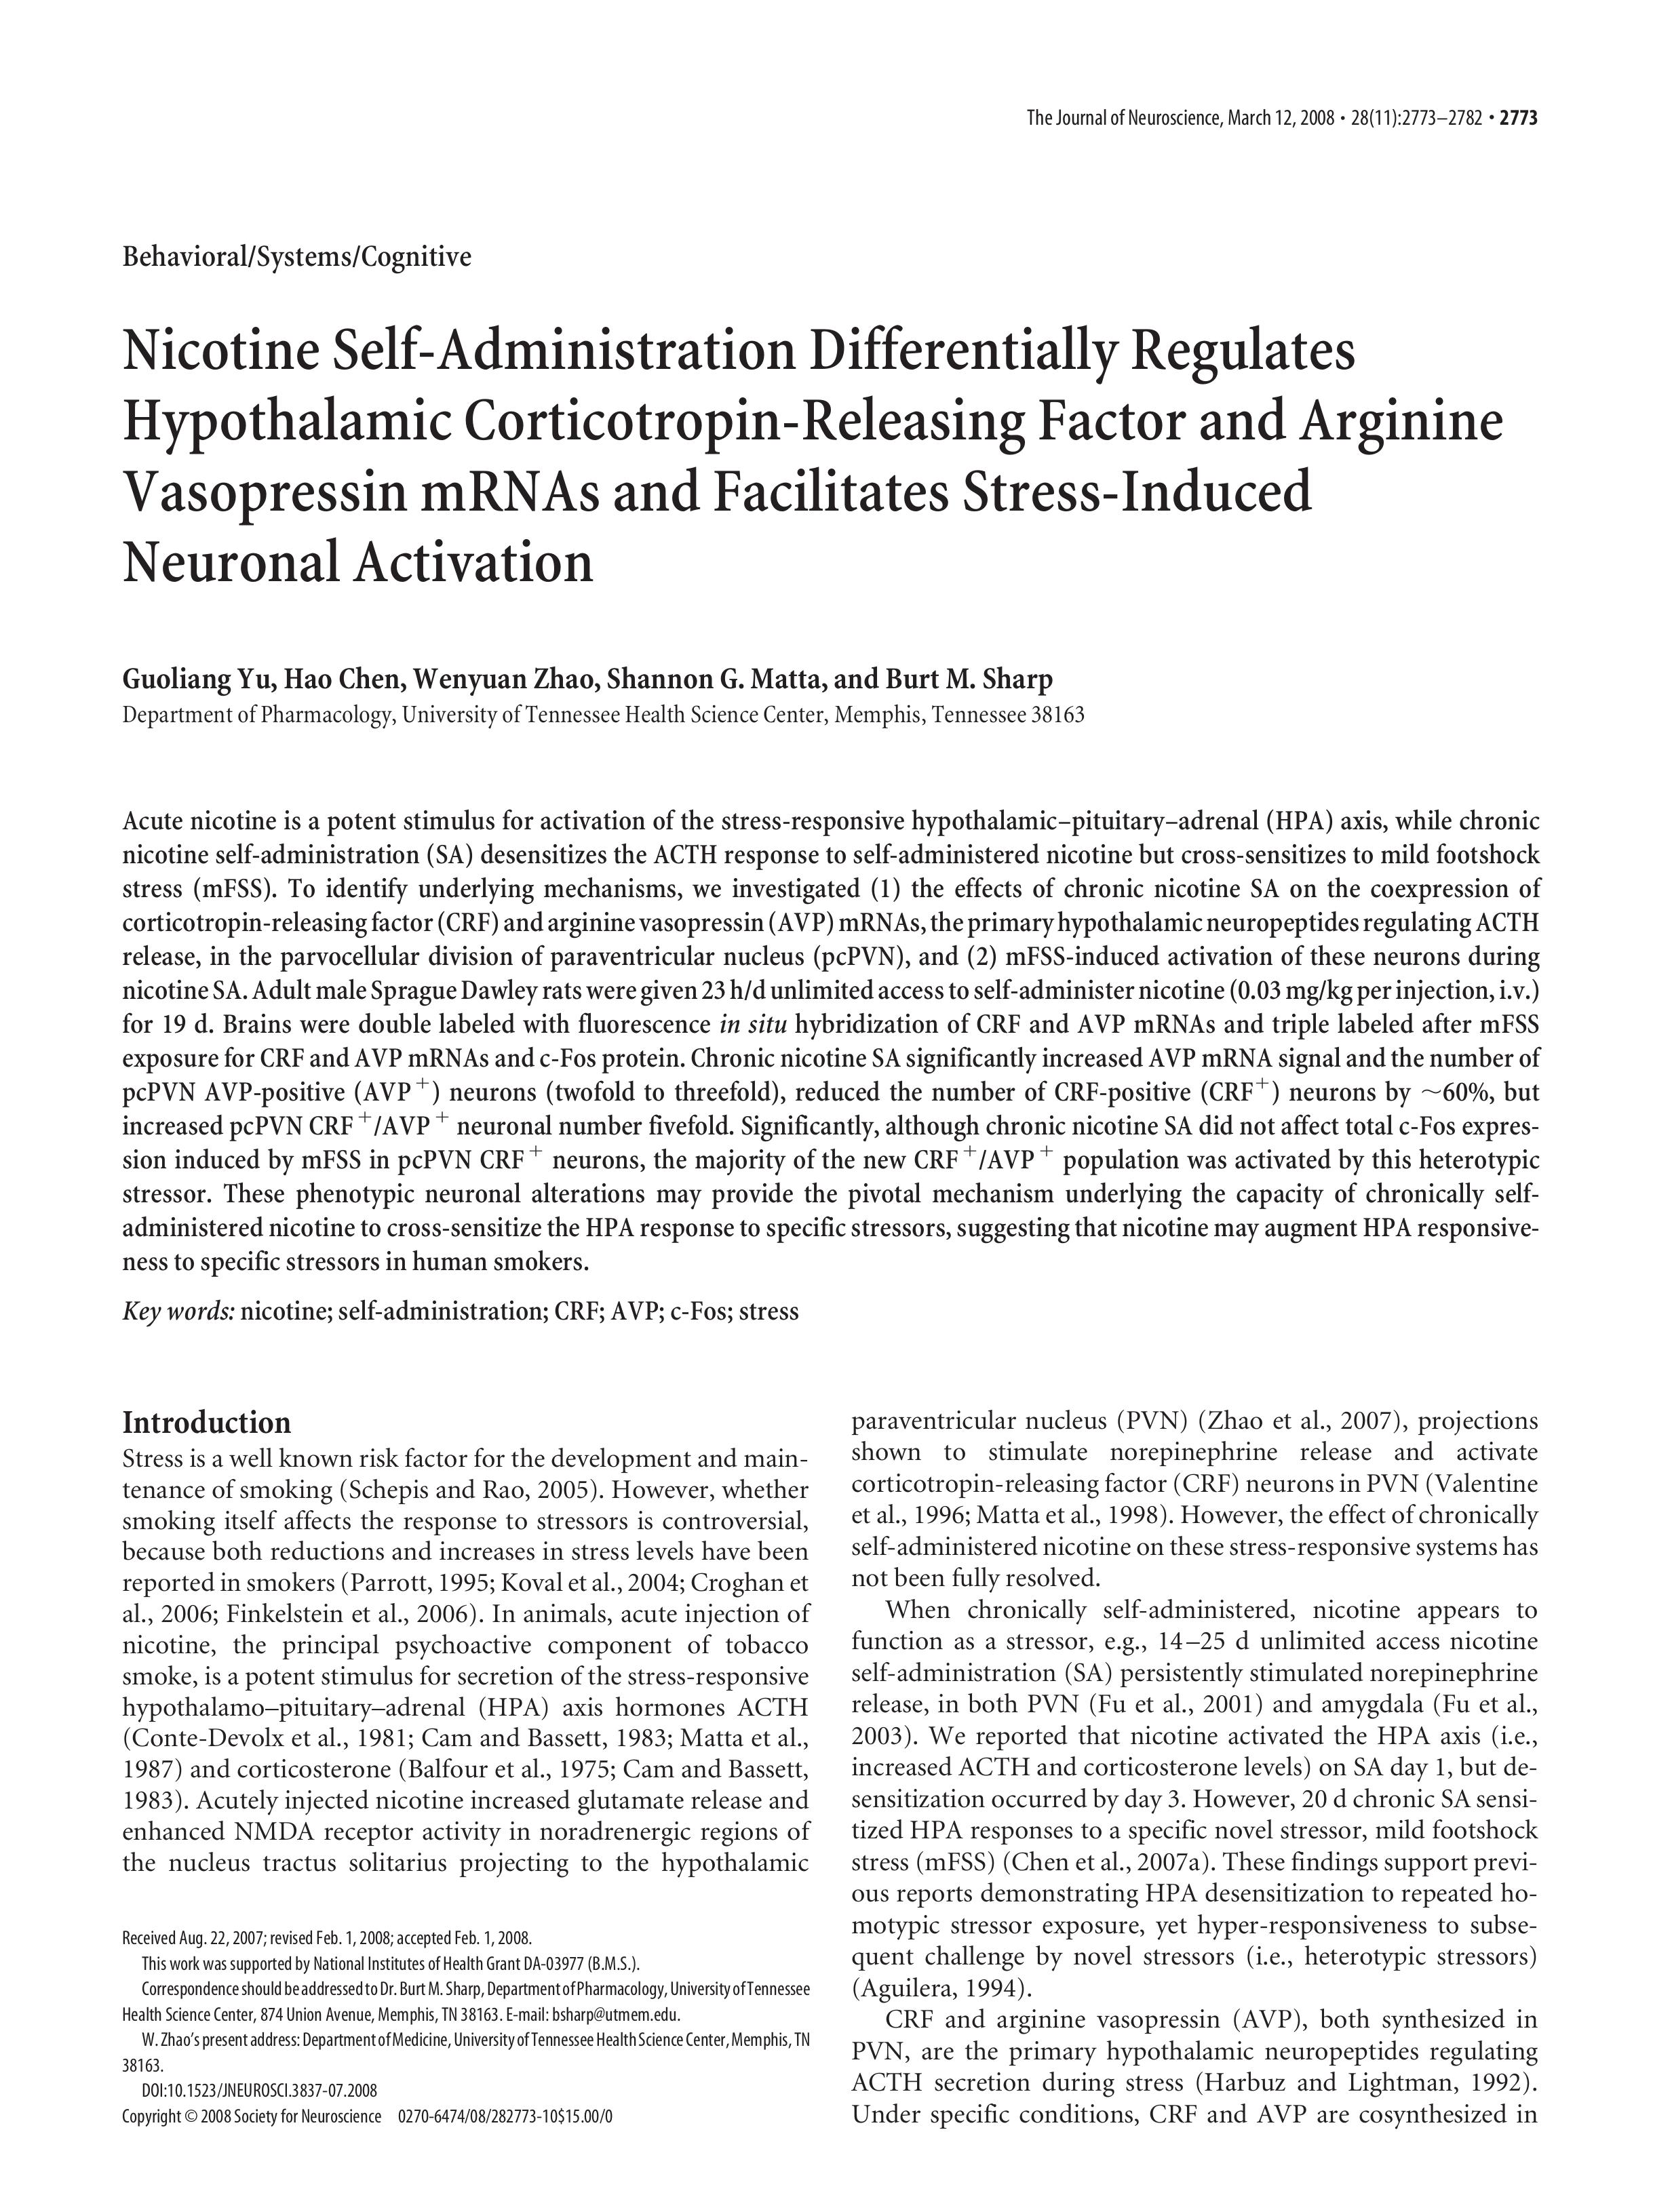 Yu et al. - 2008 - J Neurosci.png